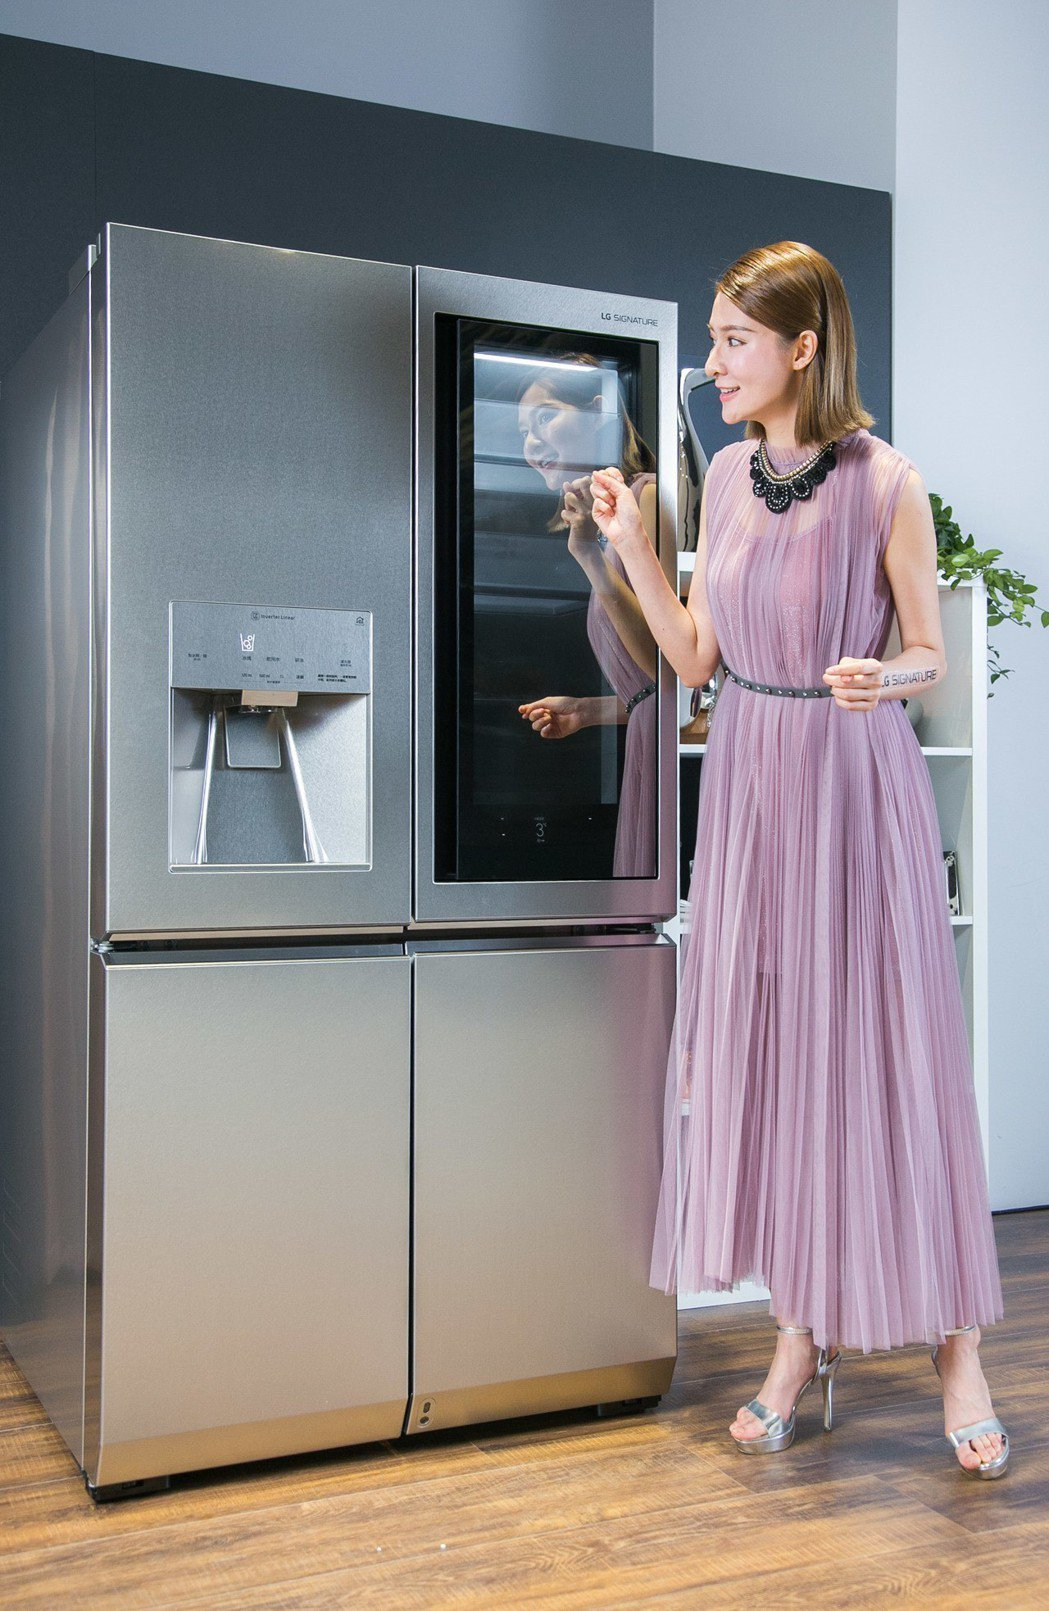 LG SIGNATRUE敲敲看門中門冰箱。圖/LG提供